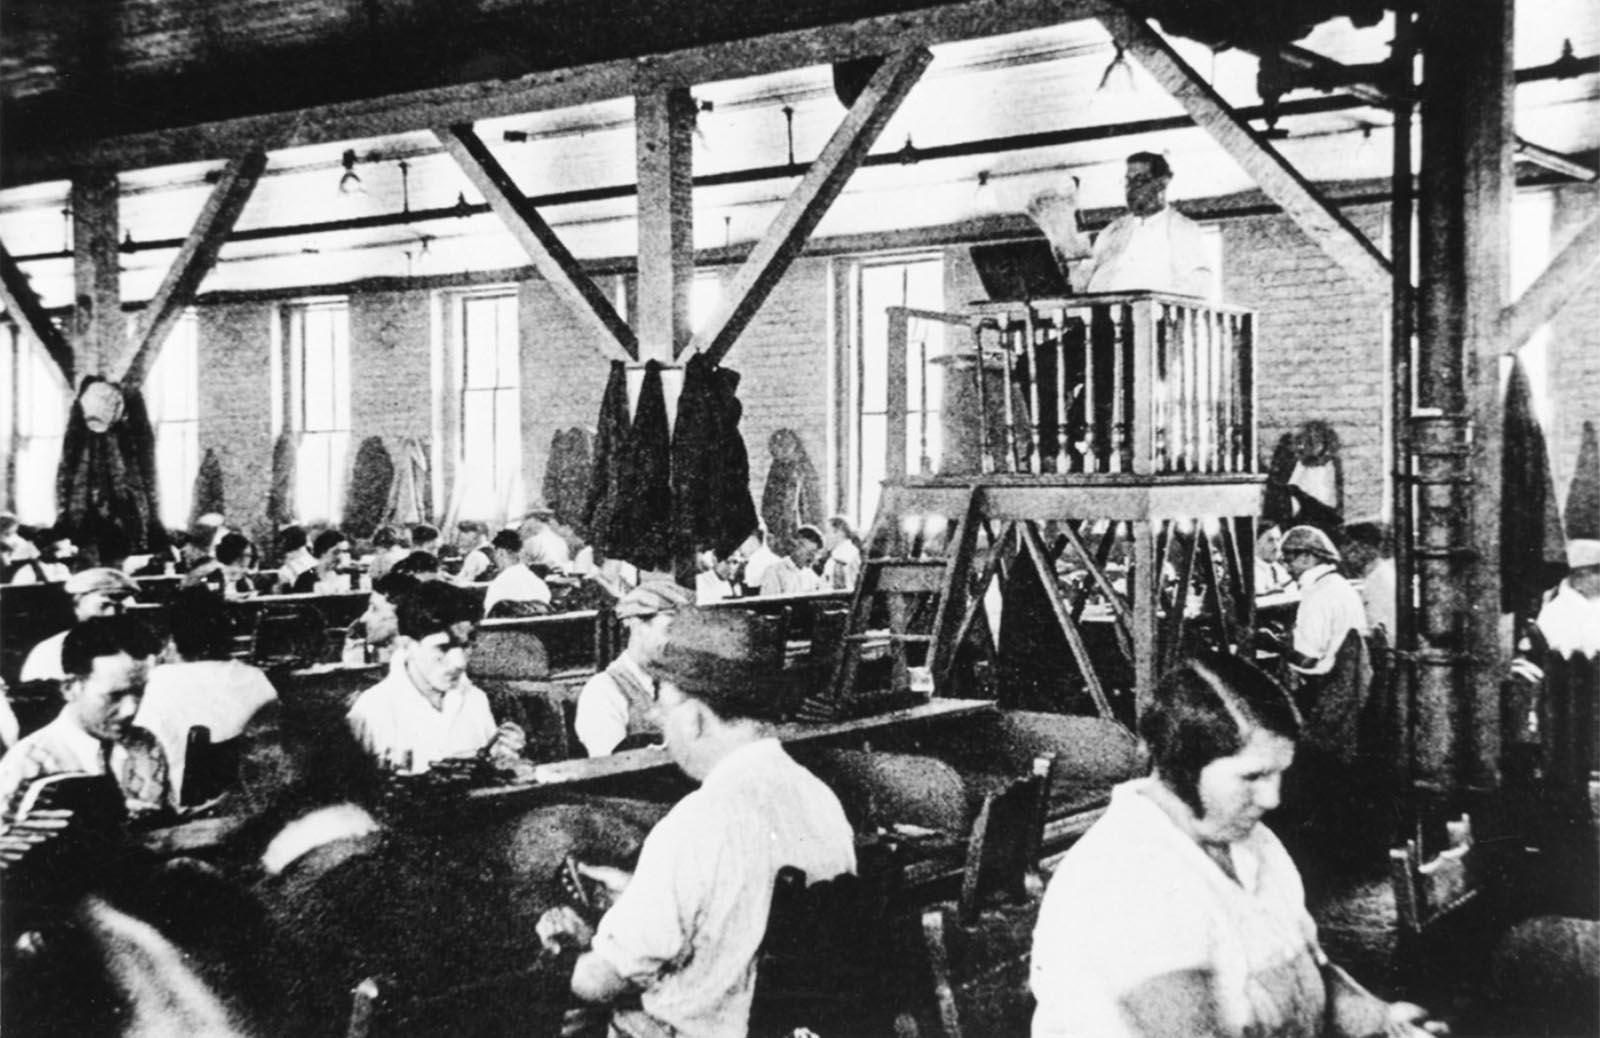 Lector in a Tampa cigar factory, circa 1930.